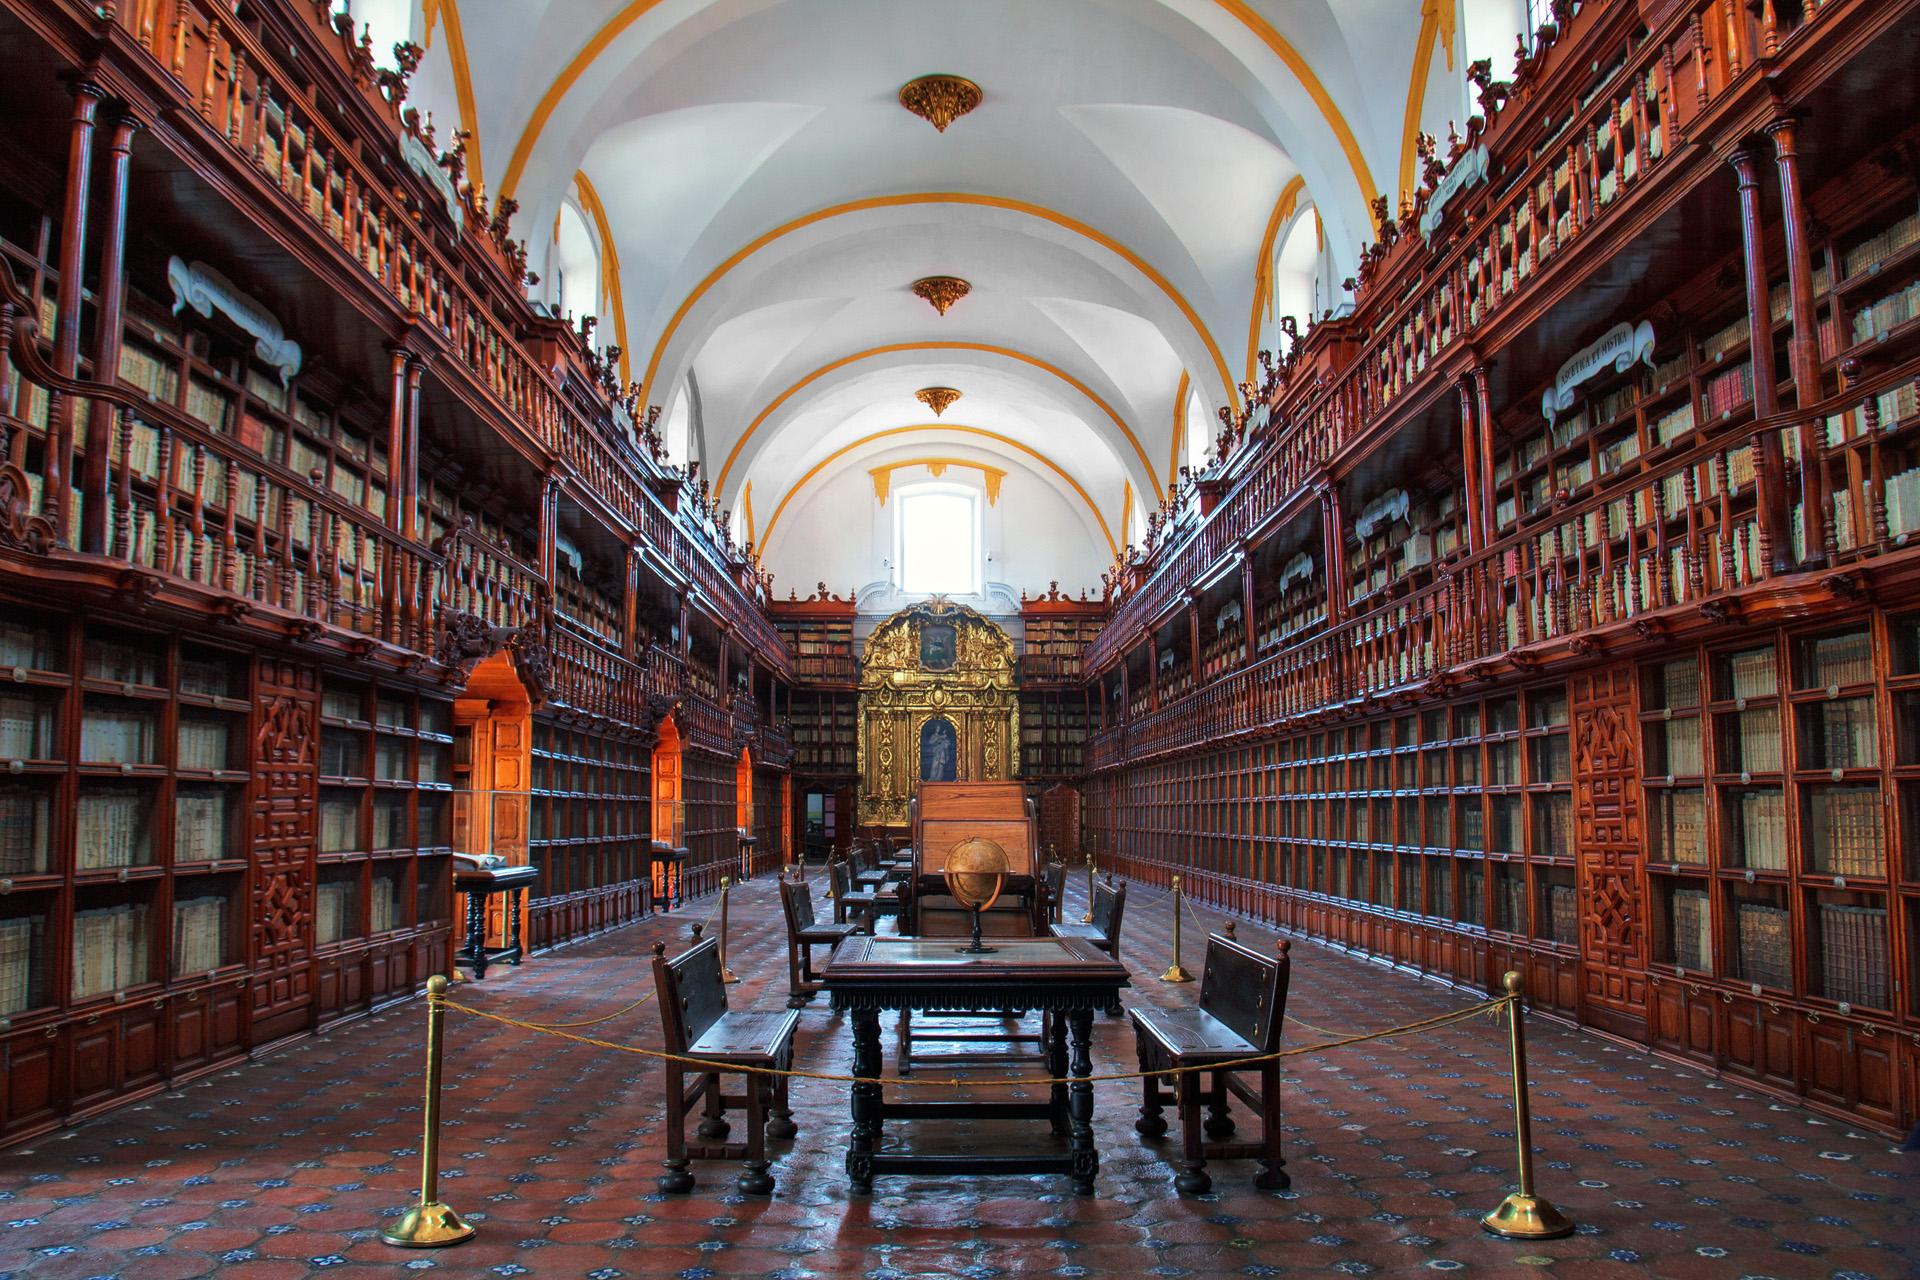 Biblioteca Palafoxiana, Mexico